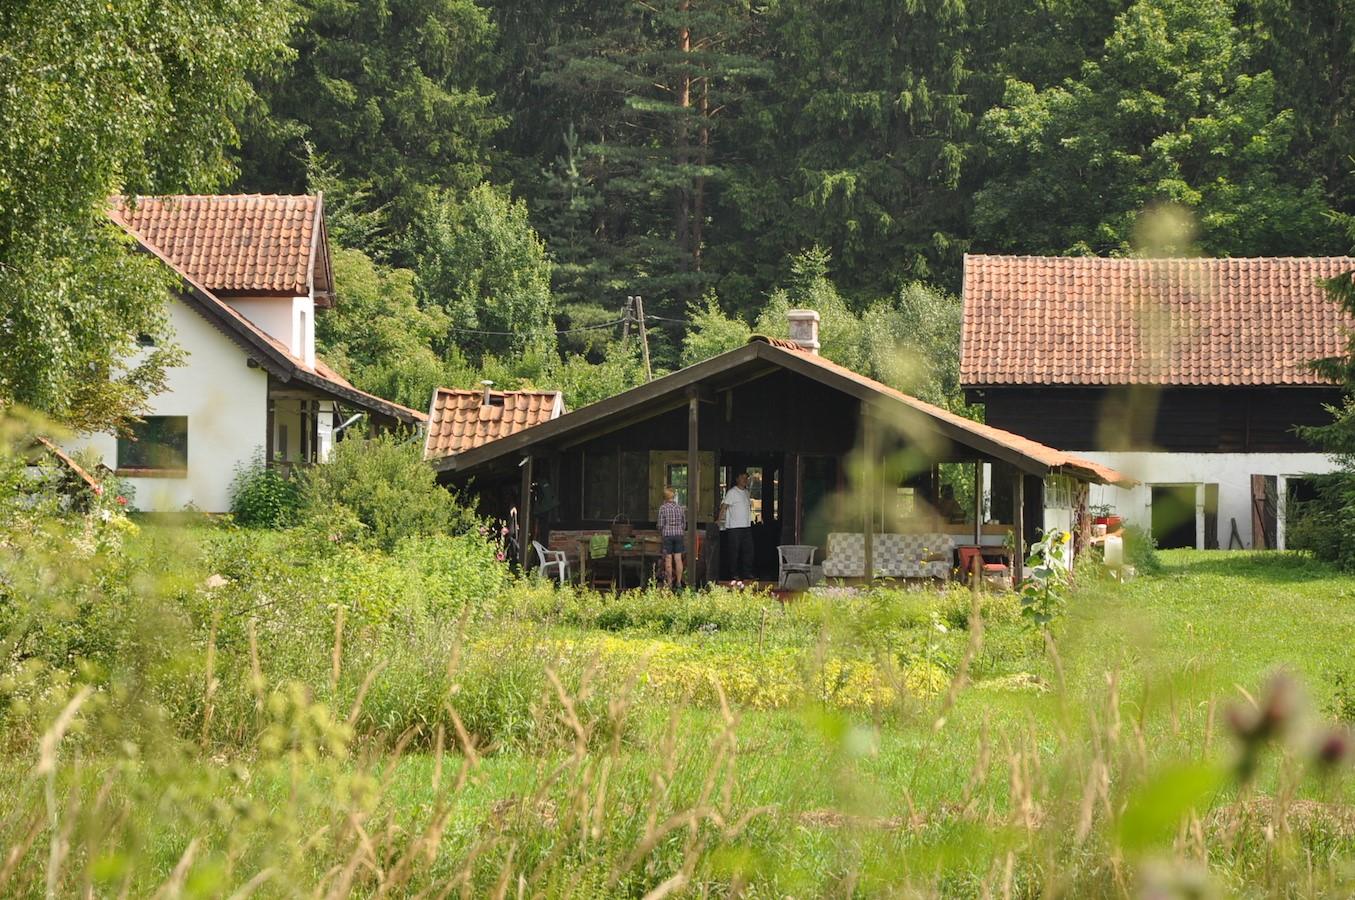 Siedlisko Letnia Kuchnia